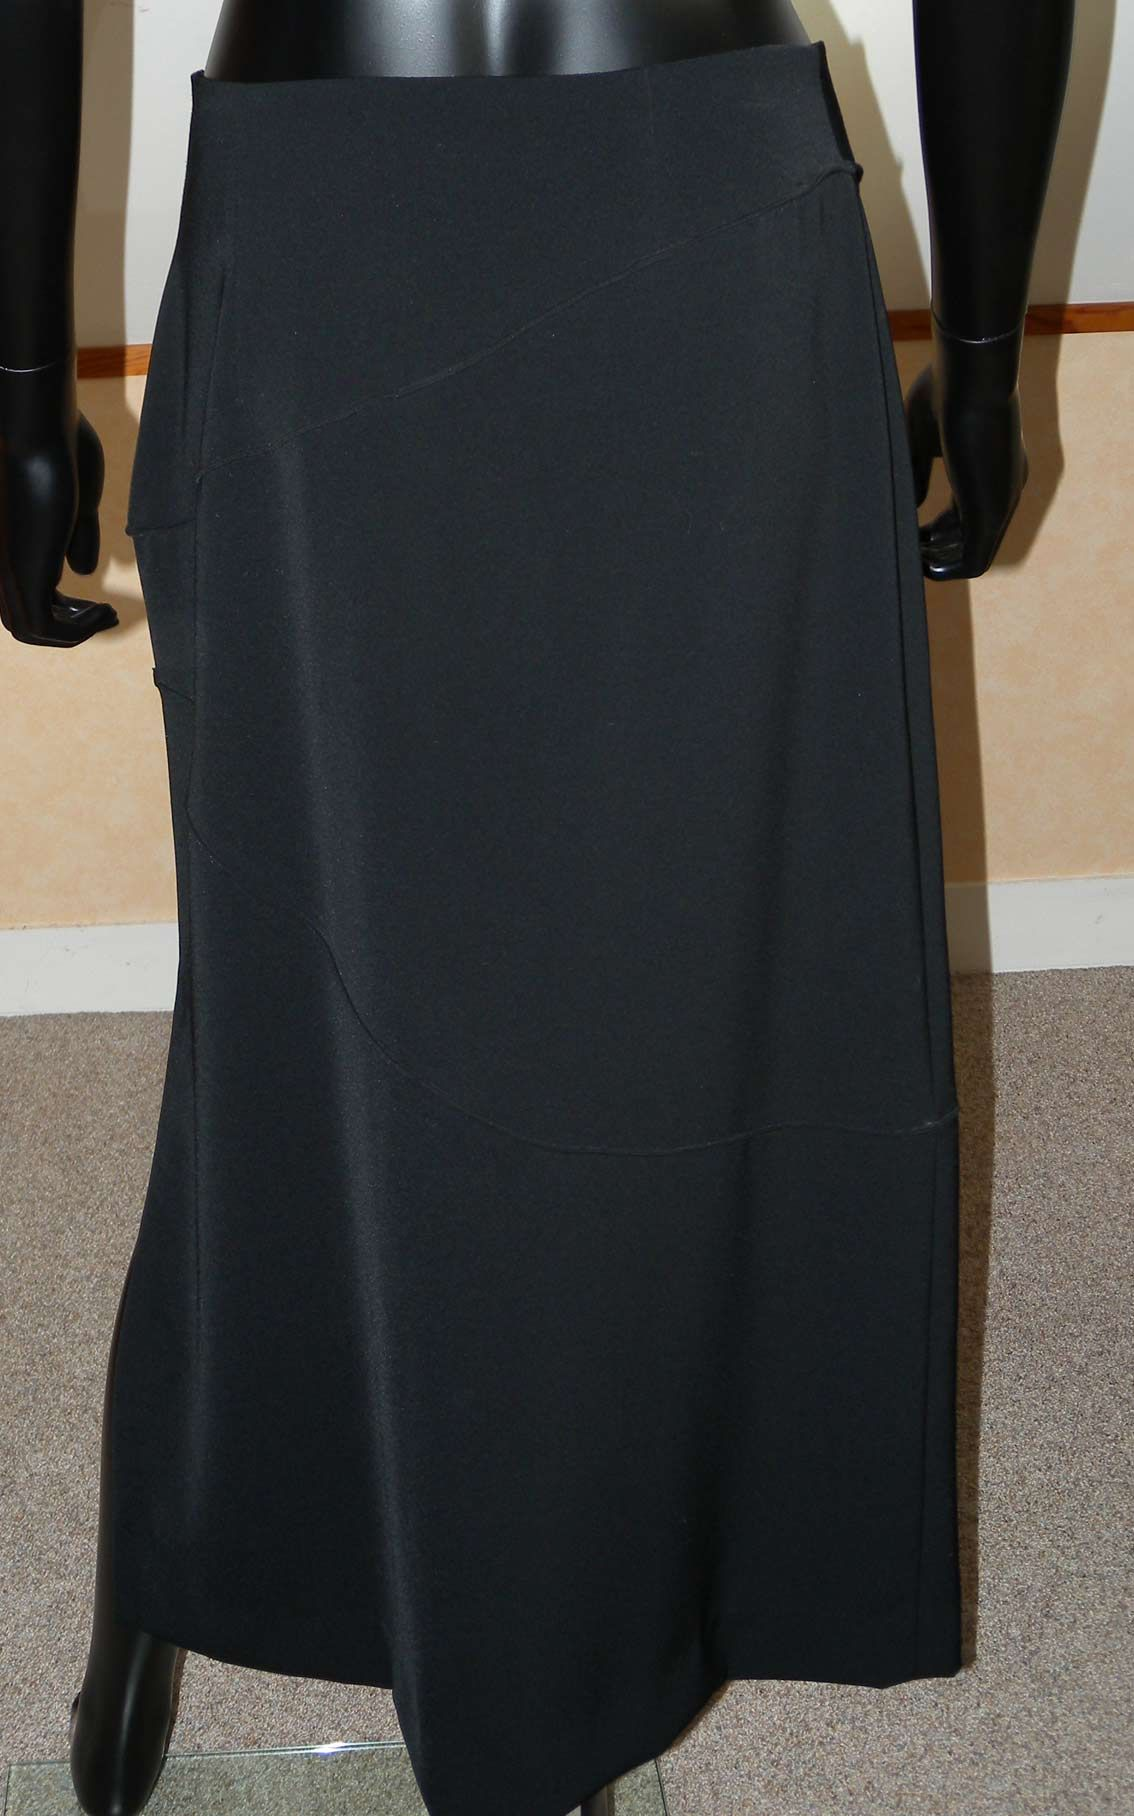 miss torrente jupe longue droite noire mode vintage femme pinterest. Black Bedroom Furniture Sets. Home Design Ideas